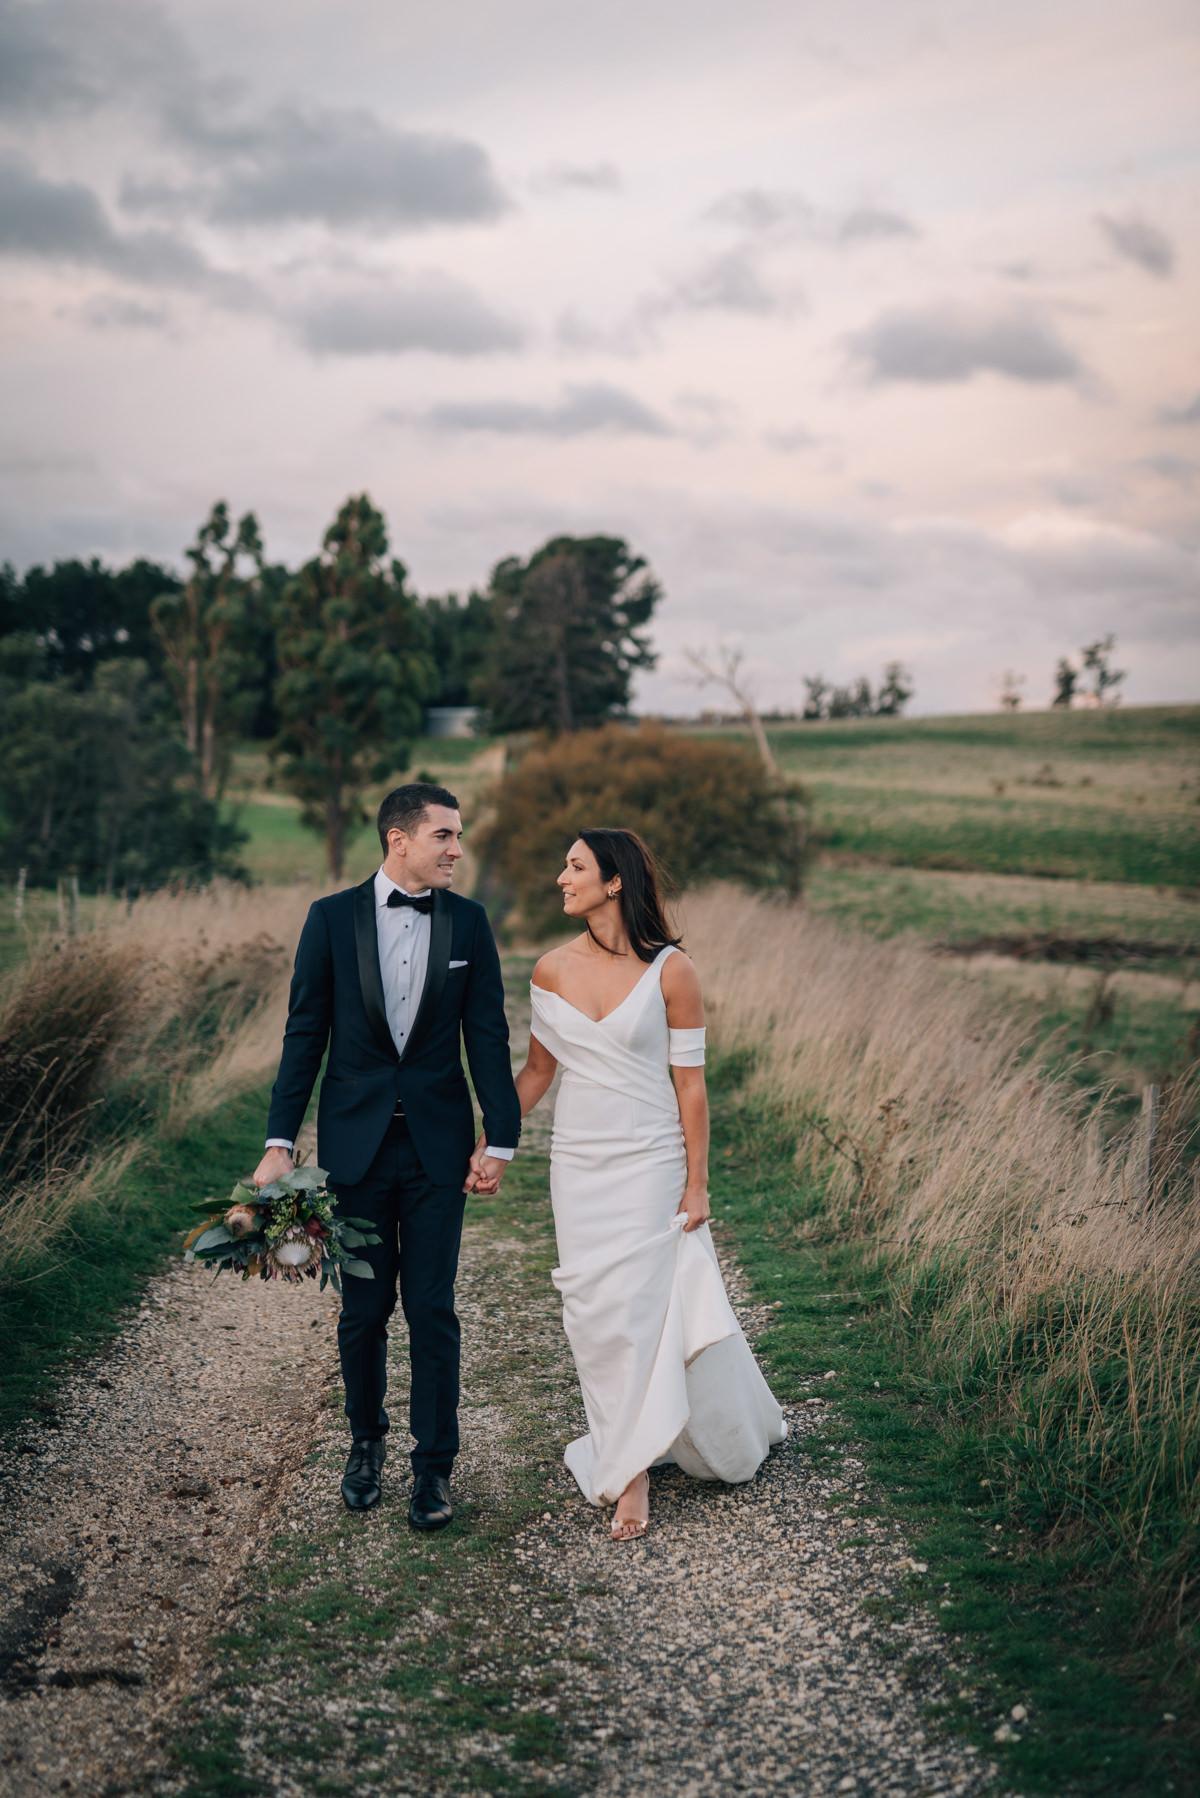 Wedding-Photohraphy-Launceston-Wines-For-Joanie-54.jpg